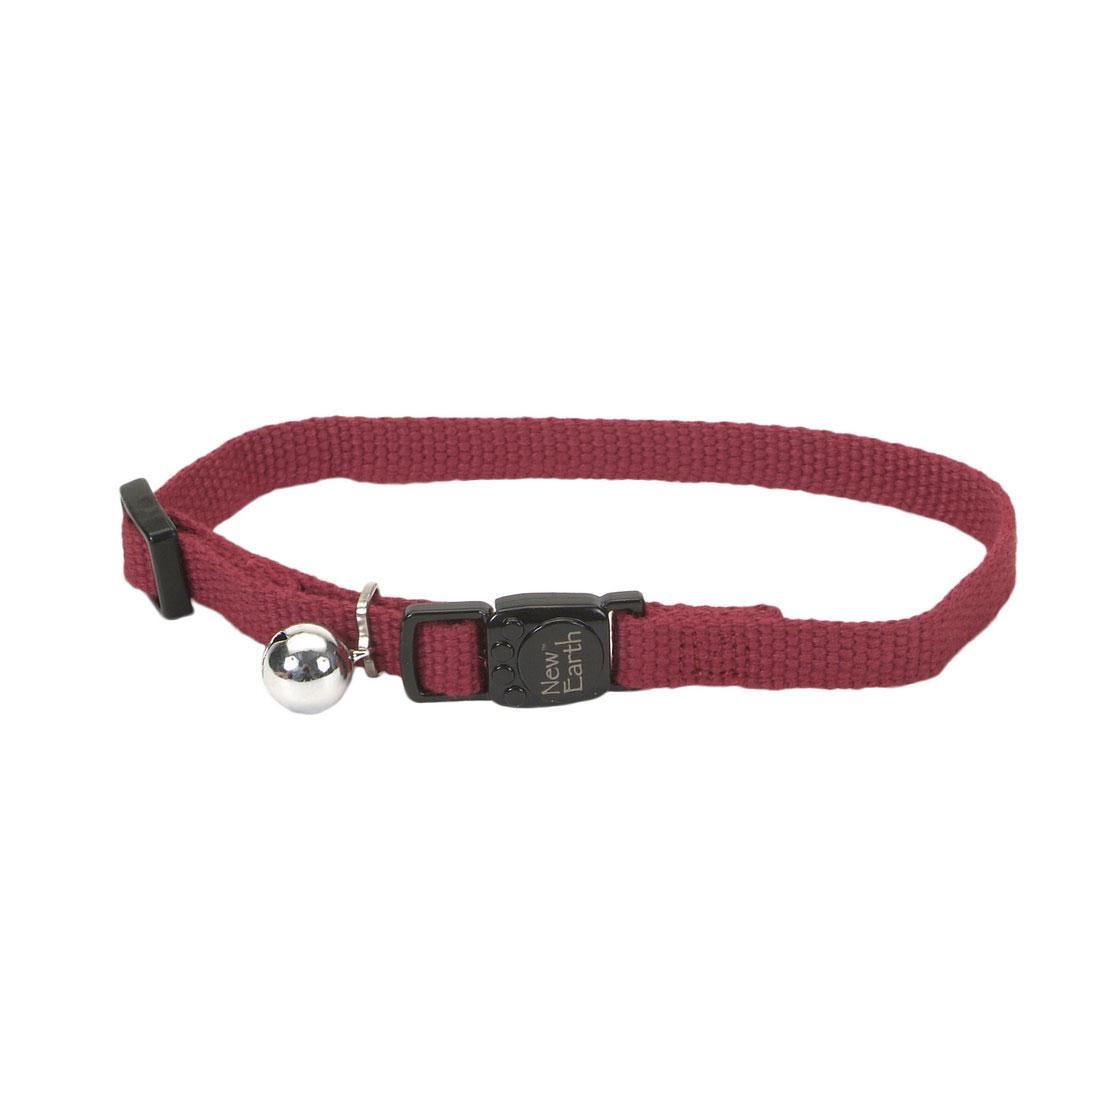 Coastal Pet New Earth Soy Adjustable Breakaway Cat Collar, Cranberry, 8-12-in